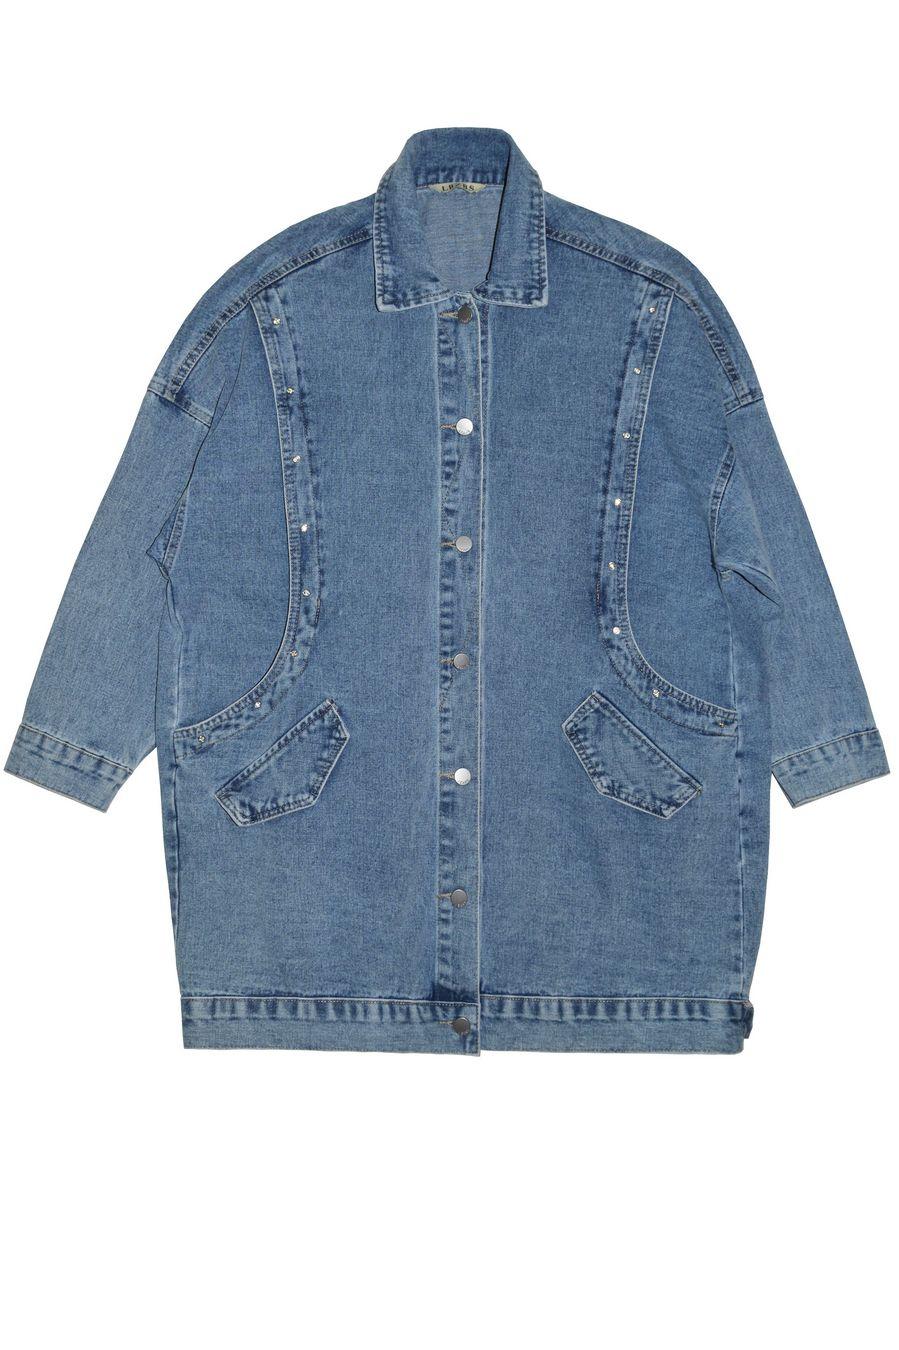 Жакет женский (джинсовка) LRZBS 2066 - фото 1